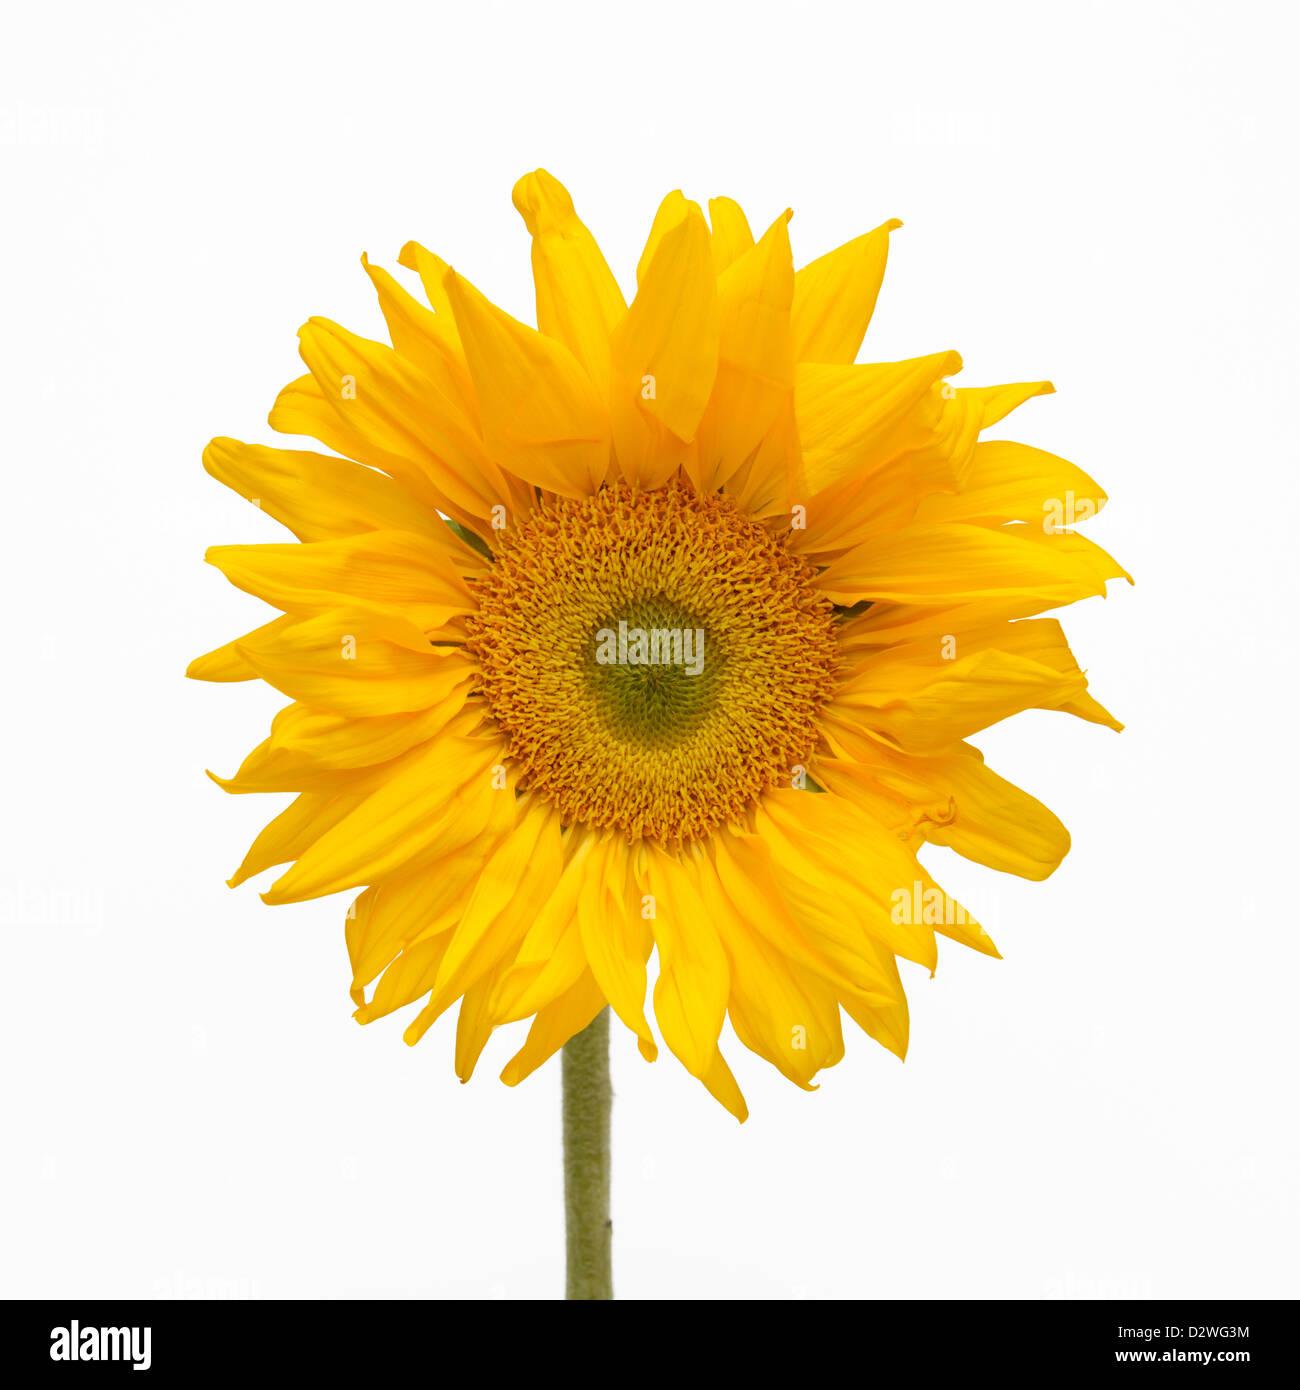 Sunflower, Helianthus annuus - Stock Image